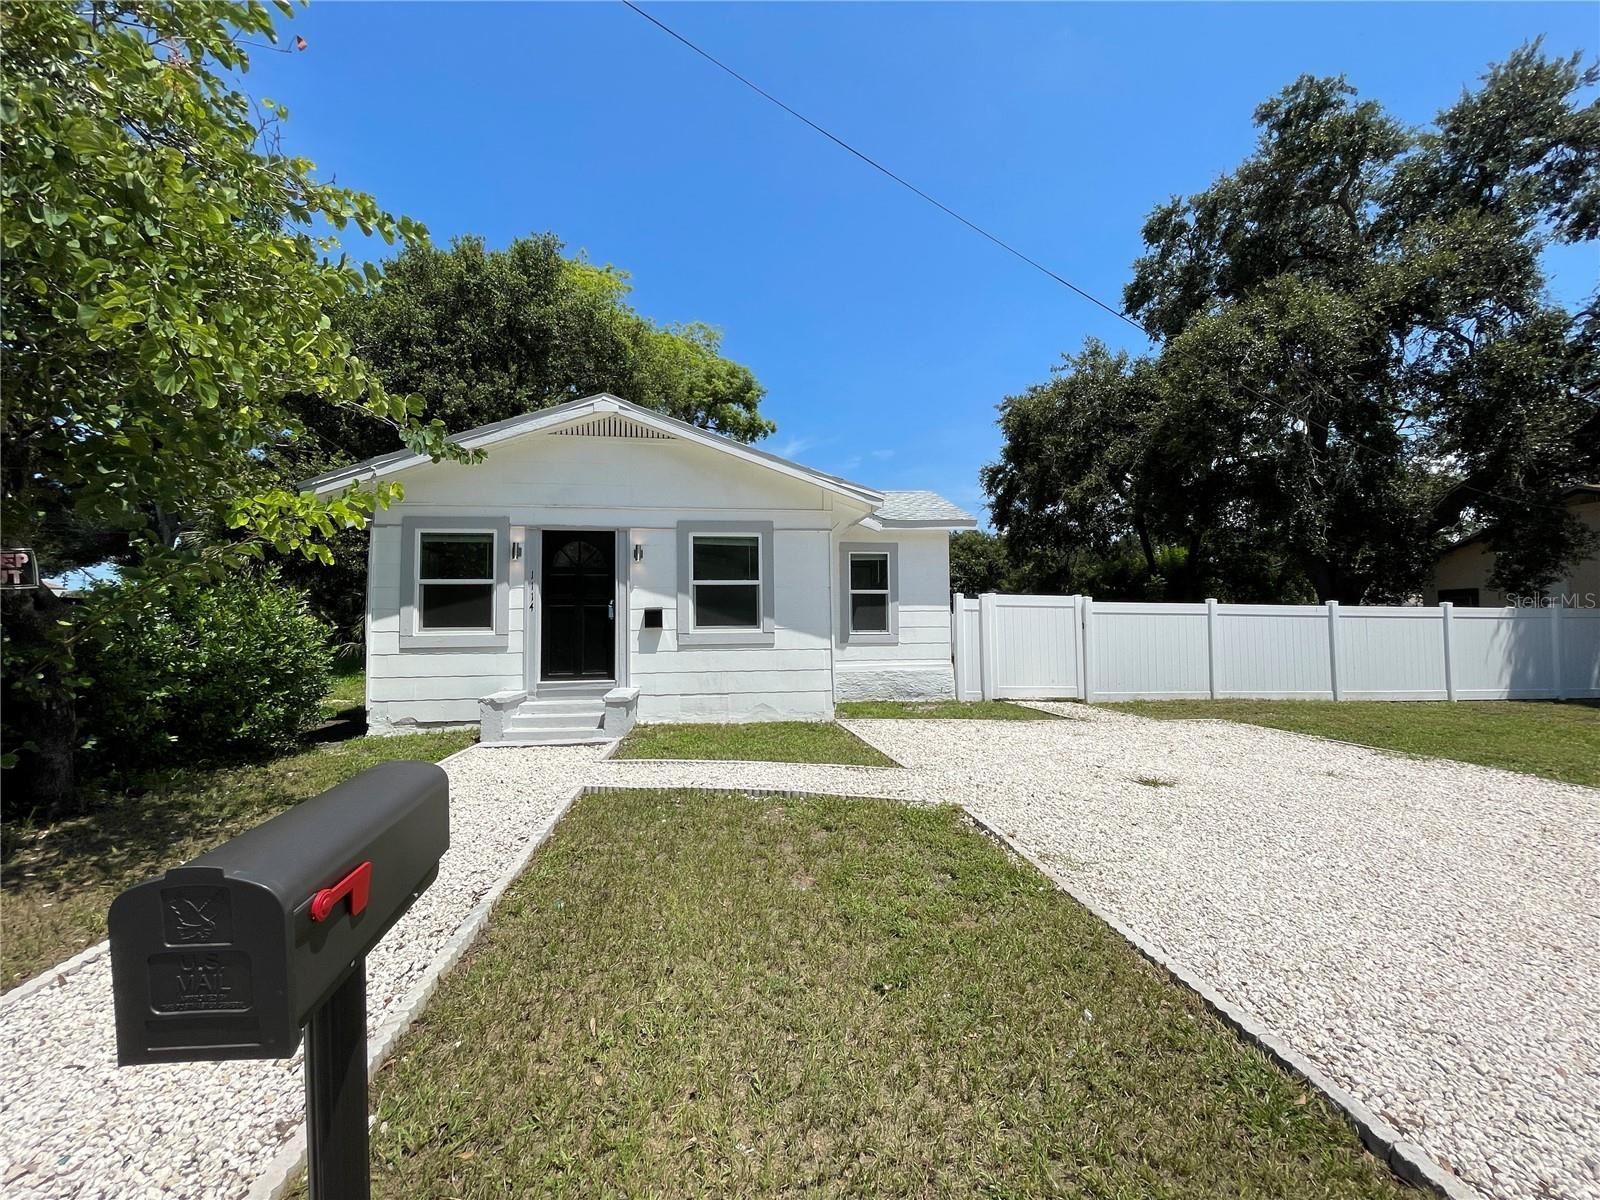 1114 PALM BLUFF STREET, Clearwater, FL 33755 - #: U8134364